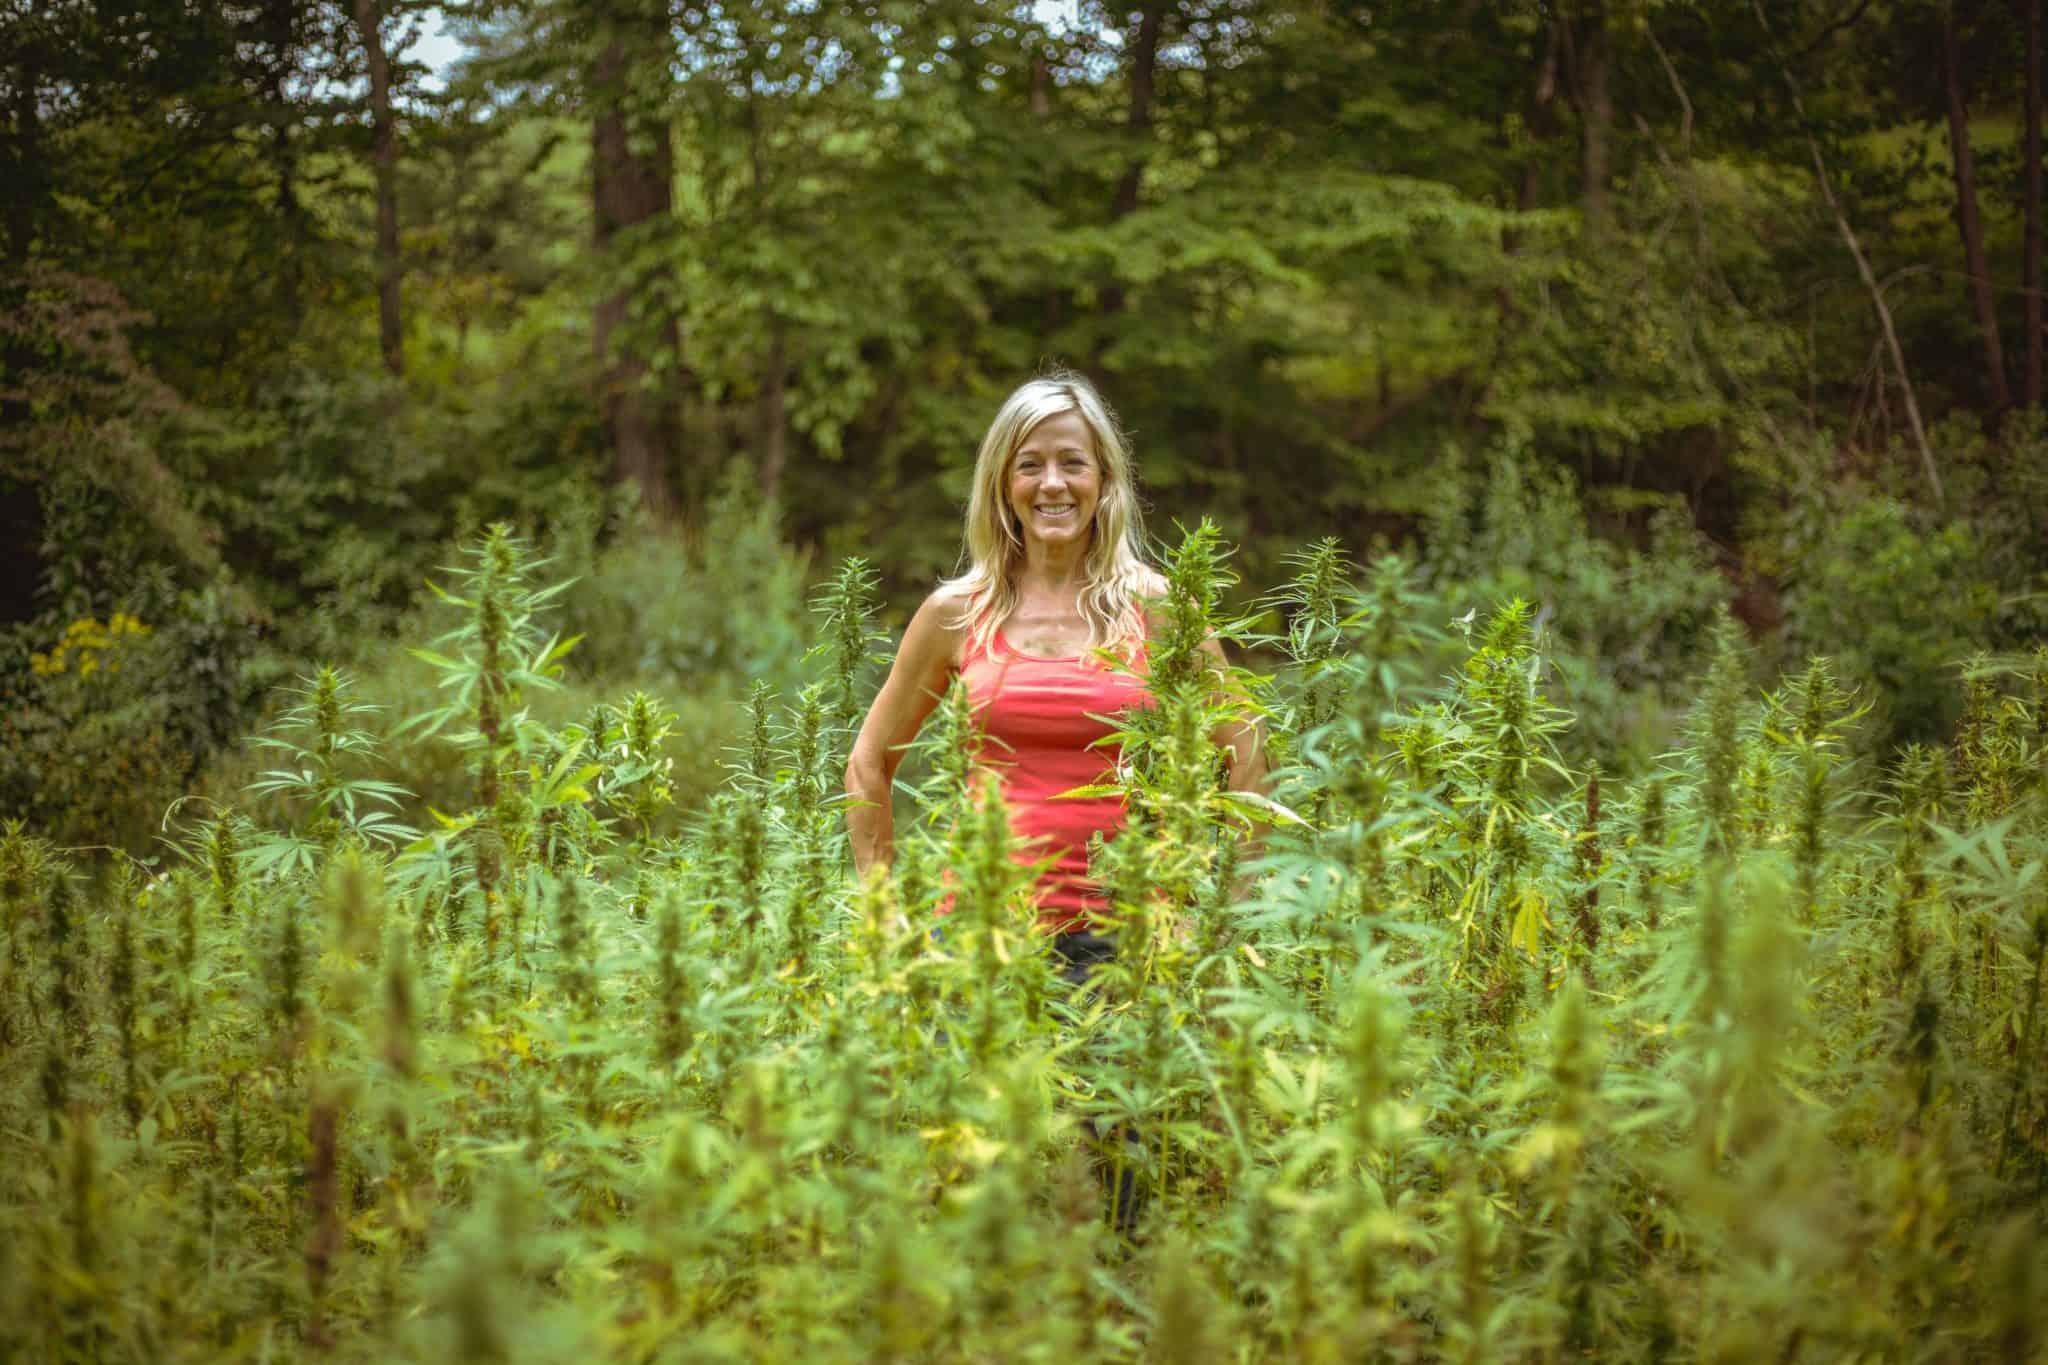 Franny Tacy on TEDx, franny's farmacy blog, hemp field, women in hemp